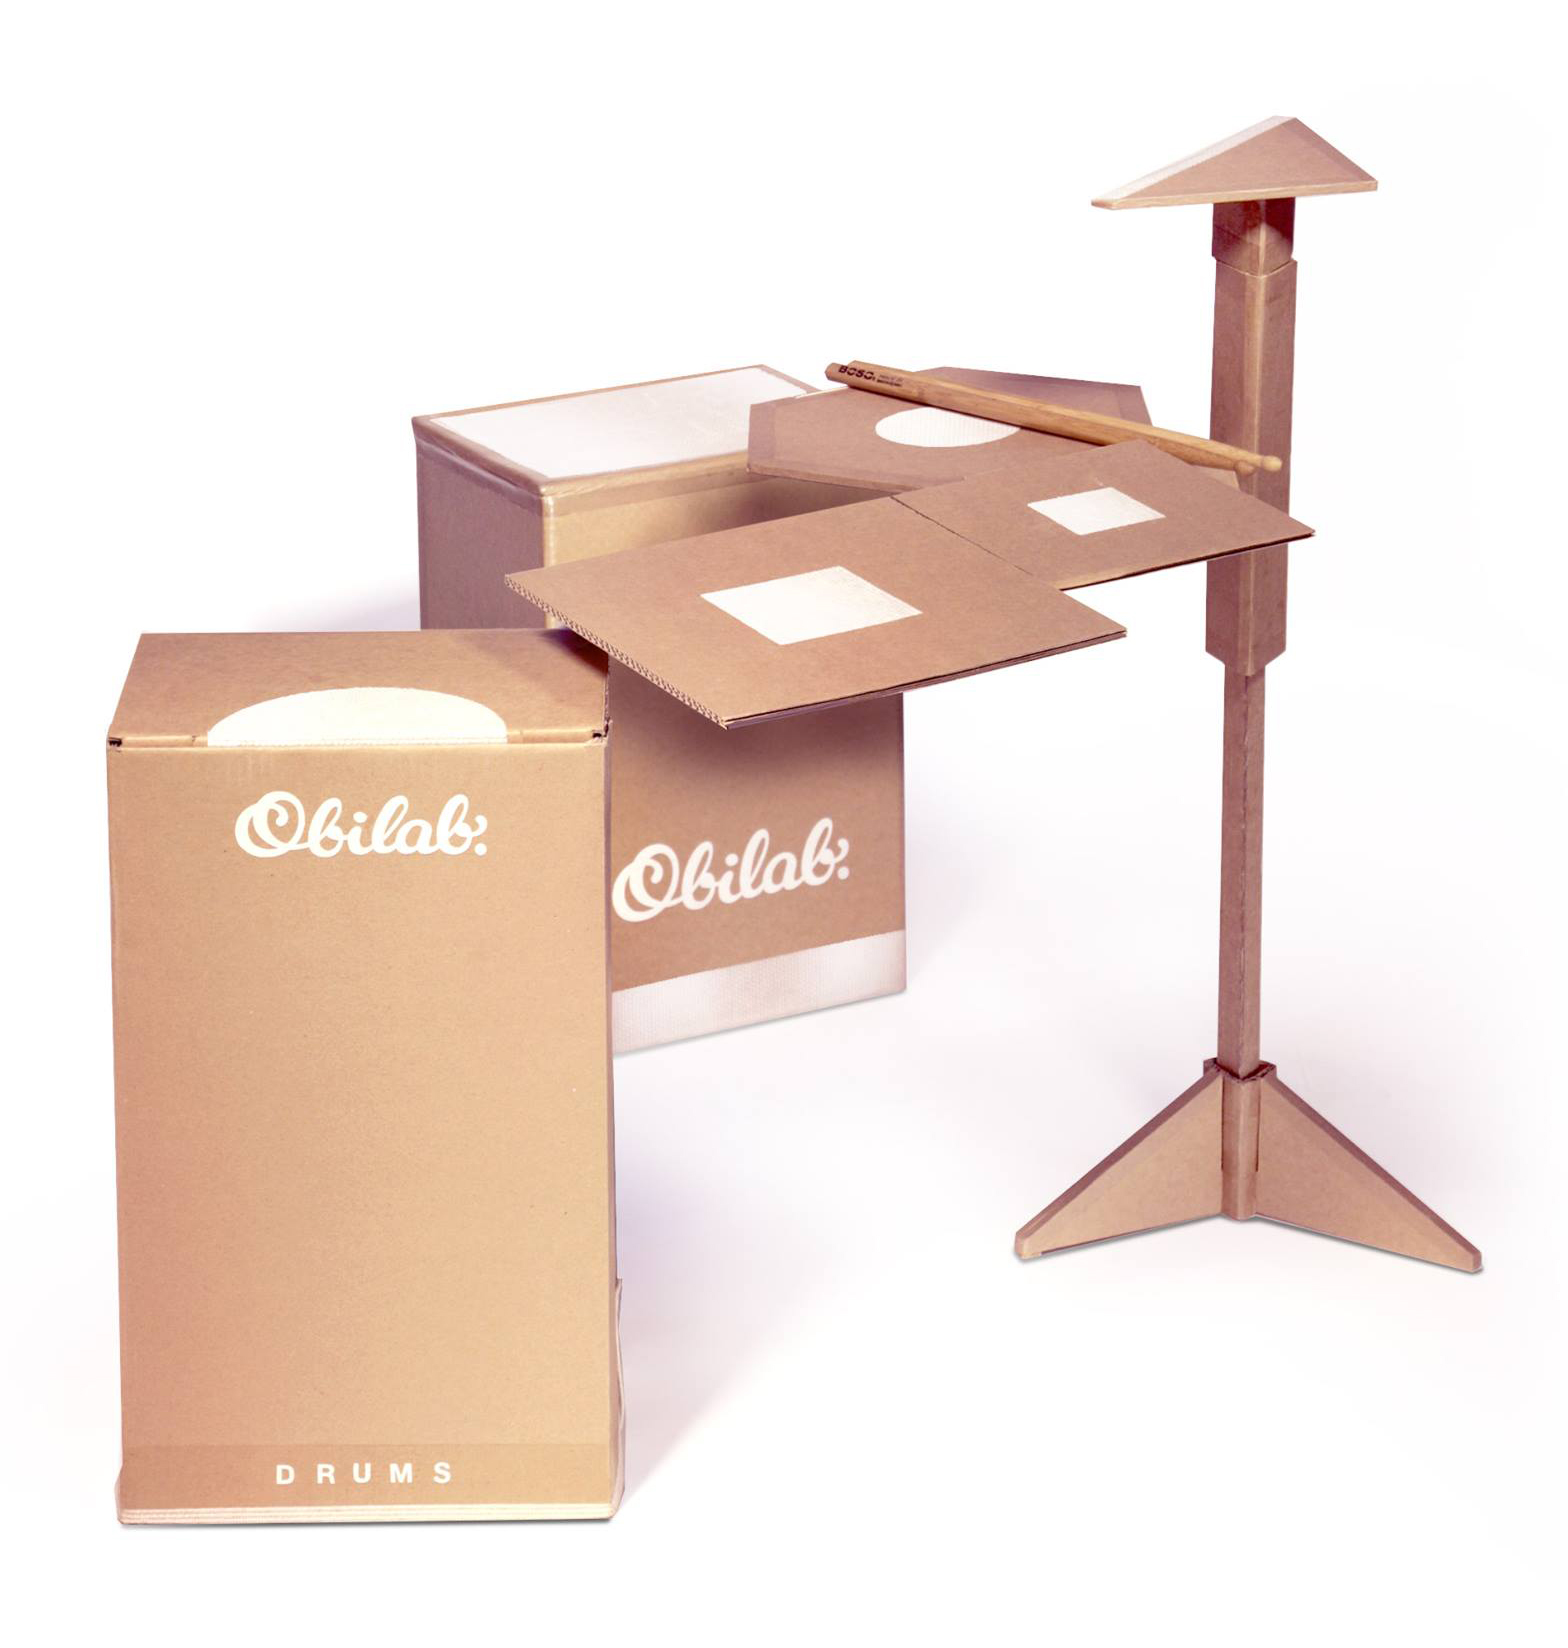 Perkusja z kartonu firmy Obilab